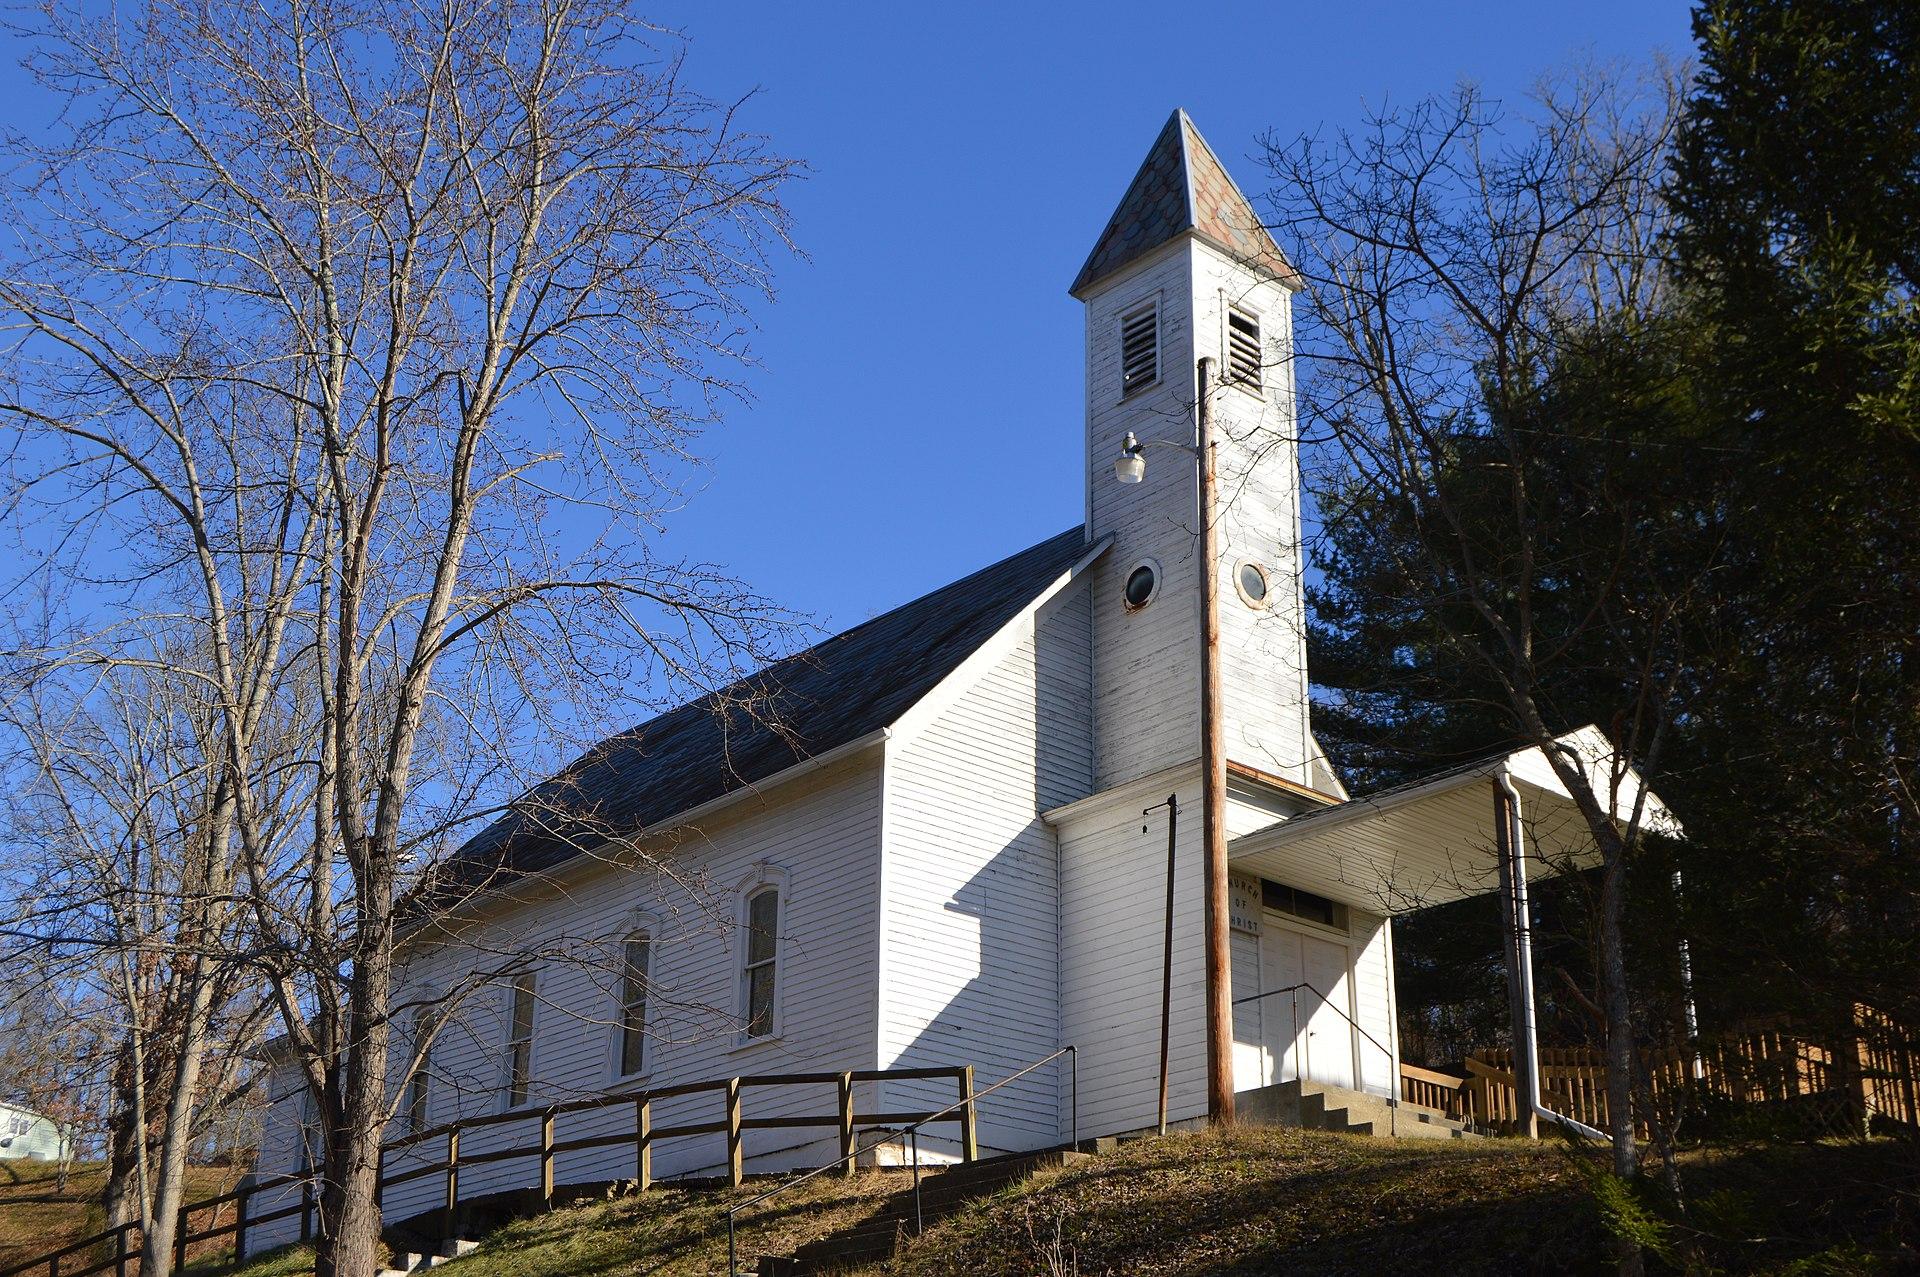 Flynns lick church of christ